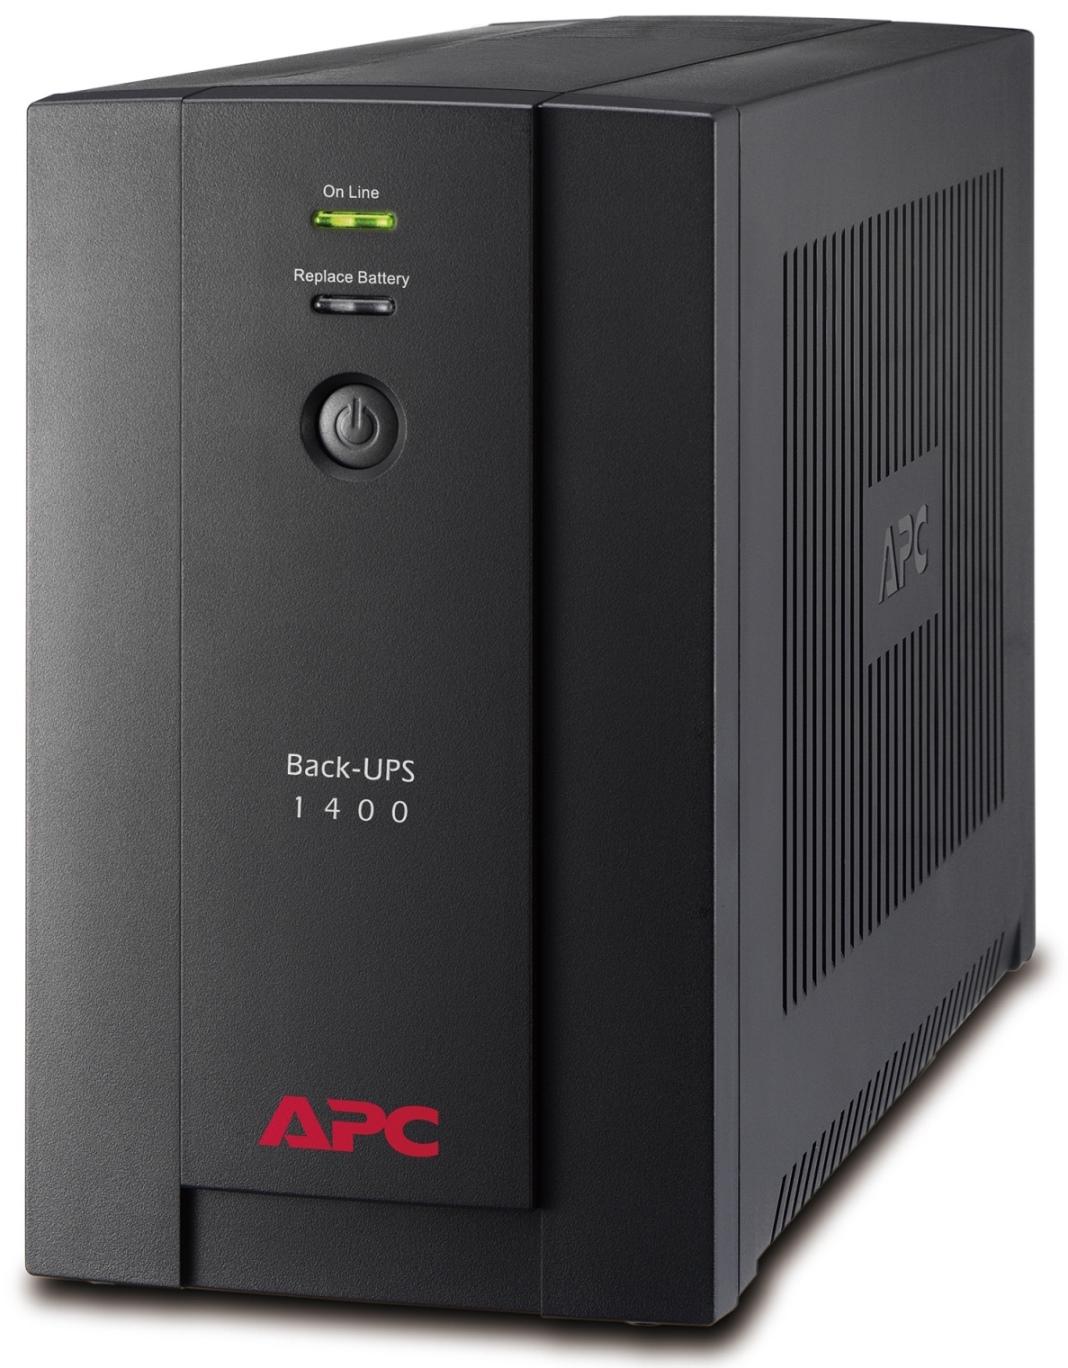 APC BACK-UPS 1400VA, 230V, AVR, French Sockets